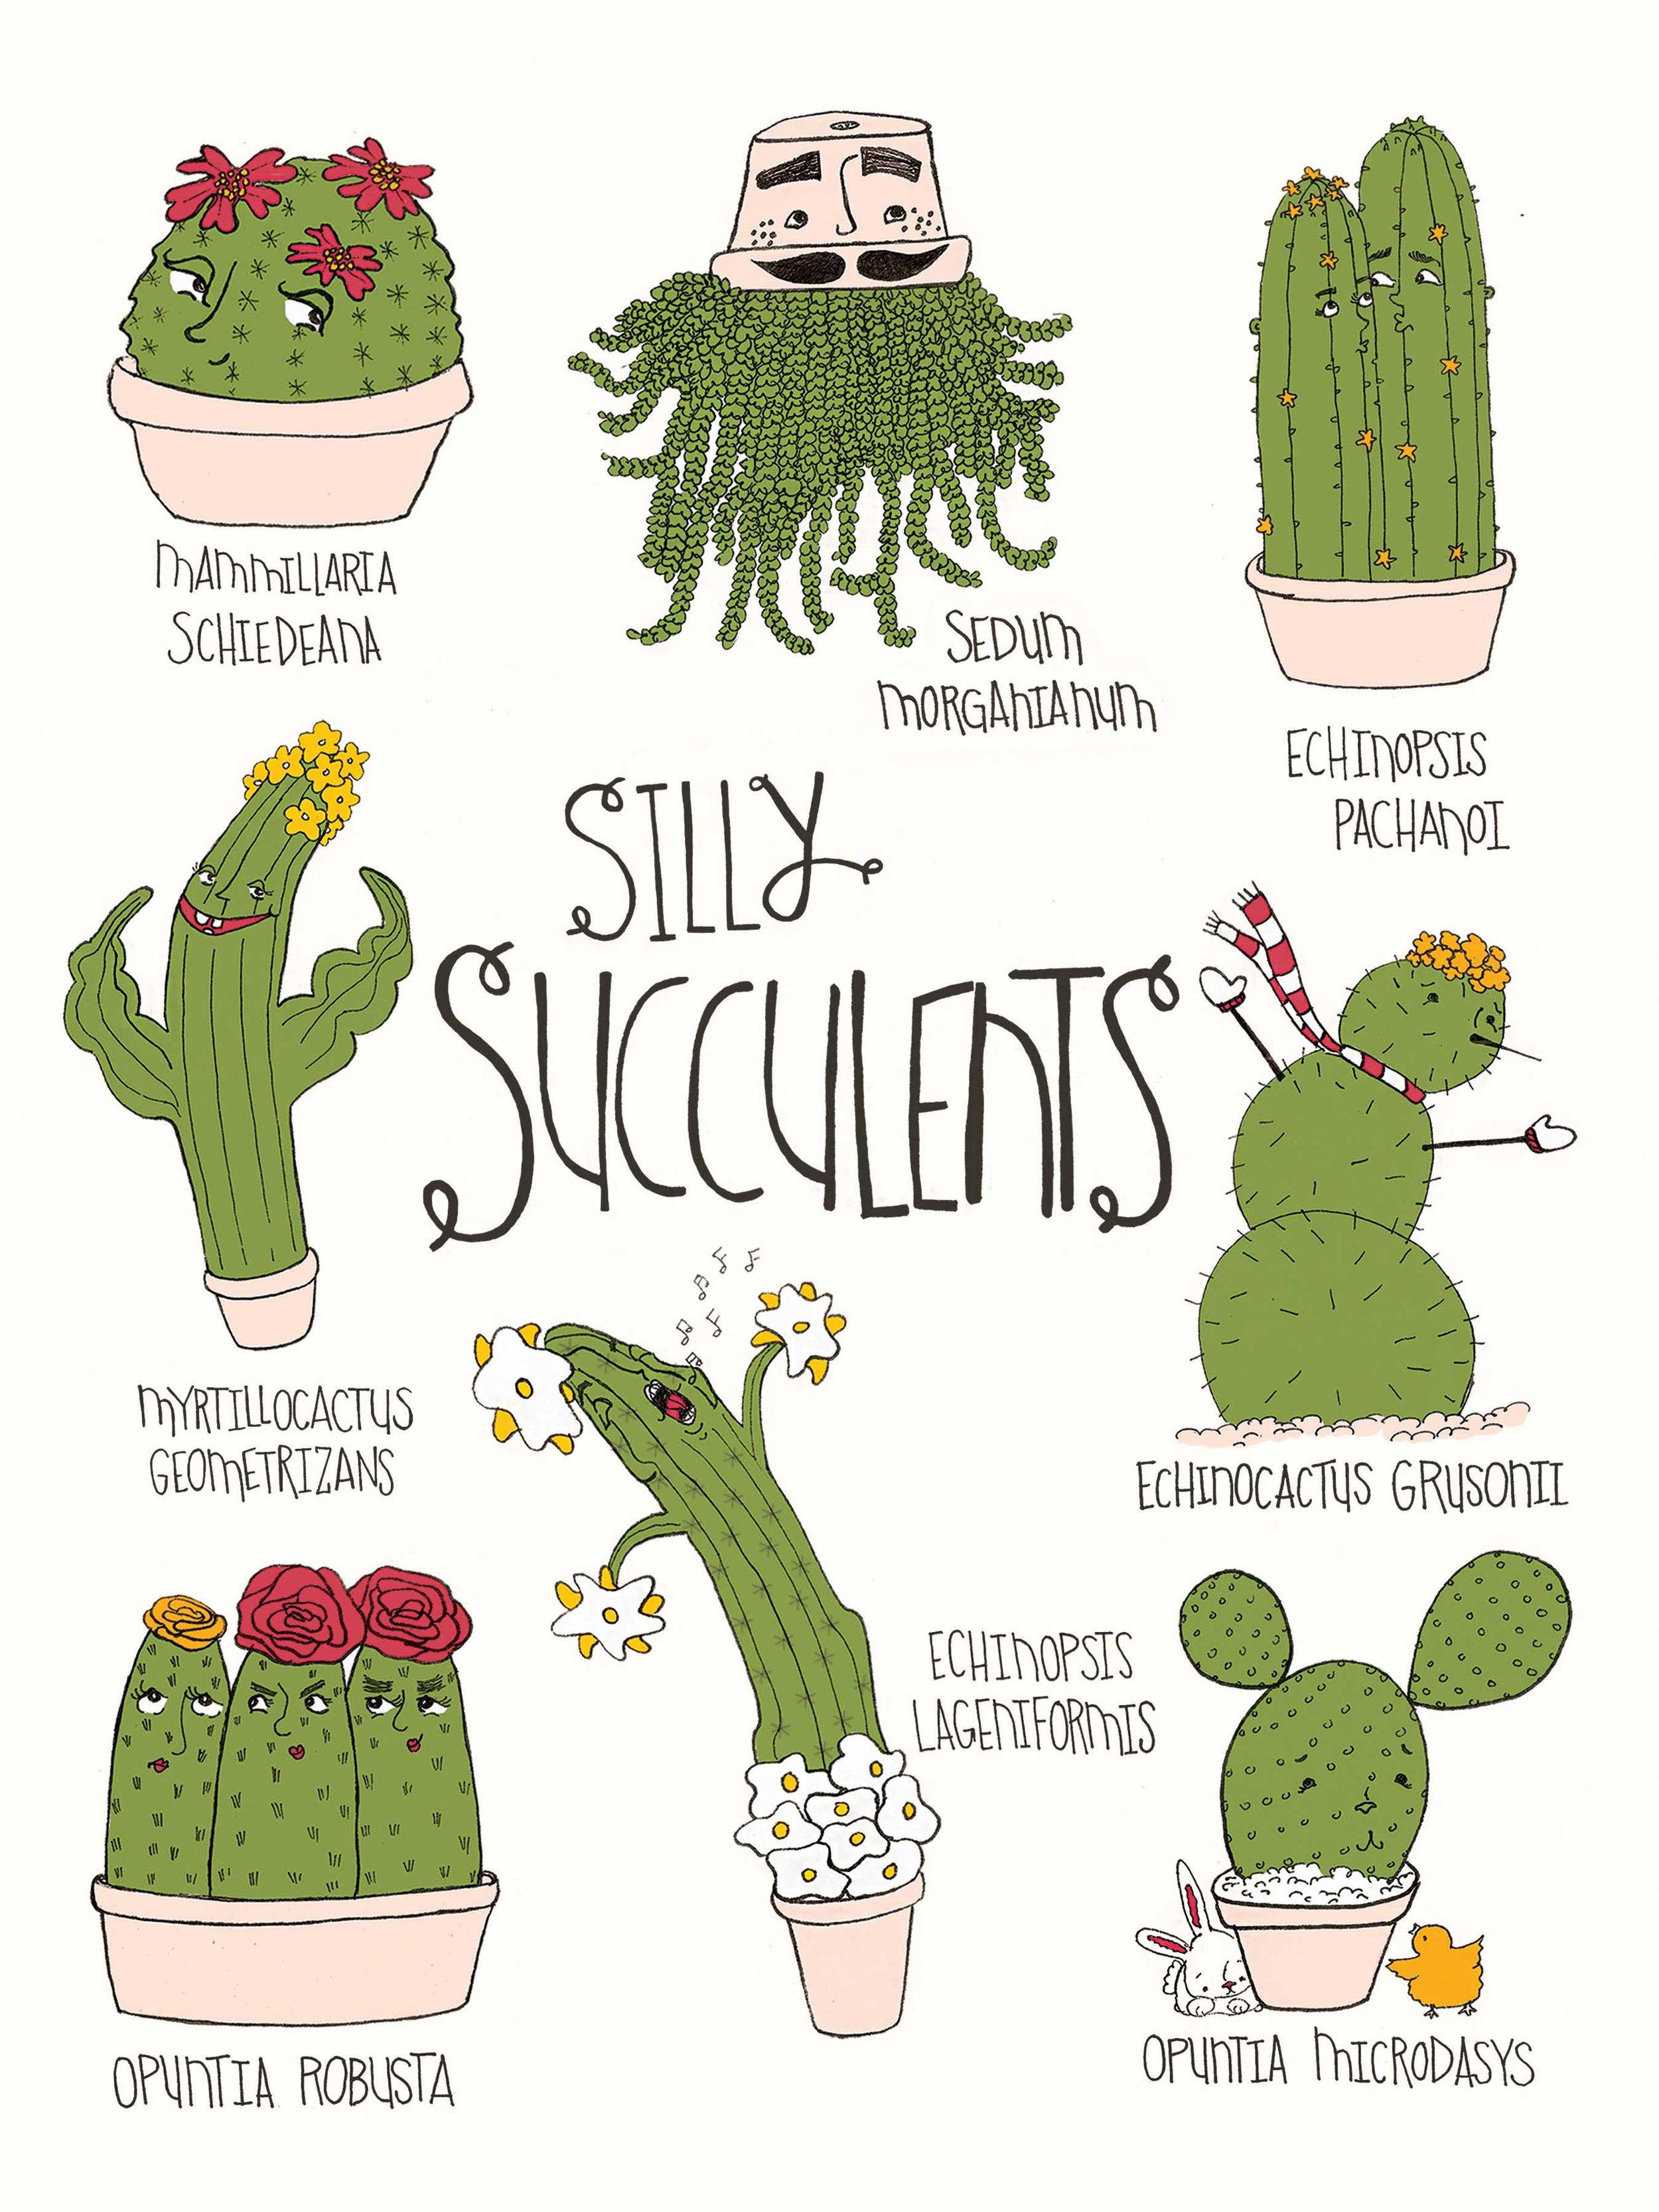 Silly Succulents 9x12.jpg